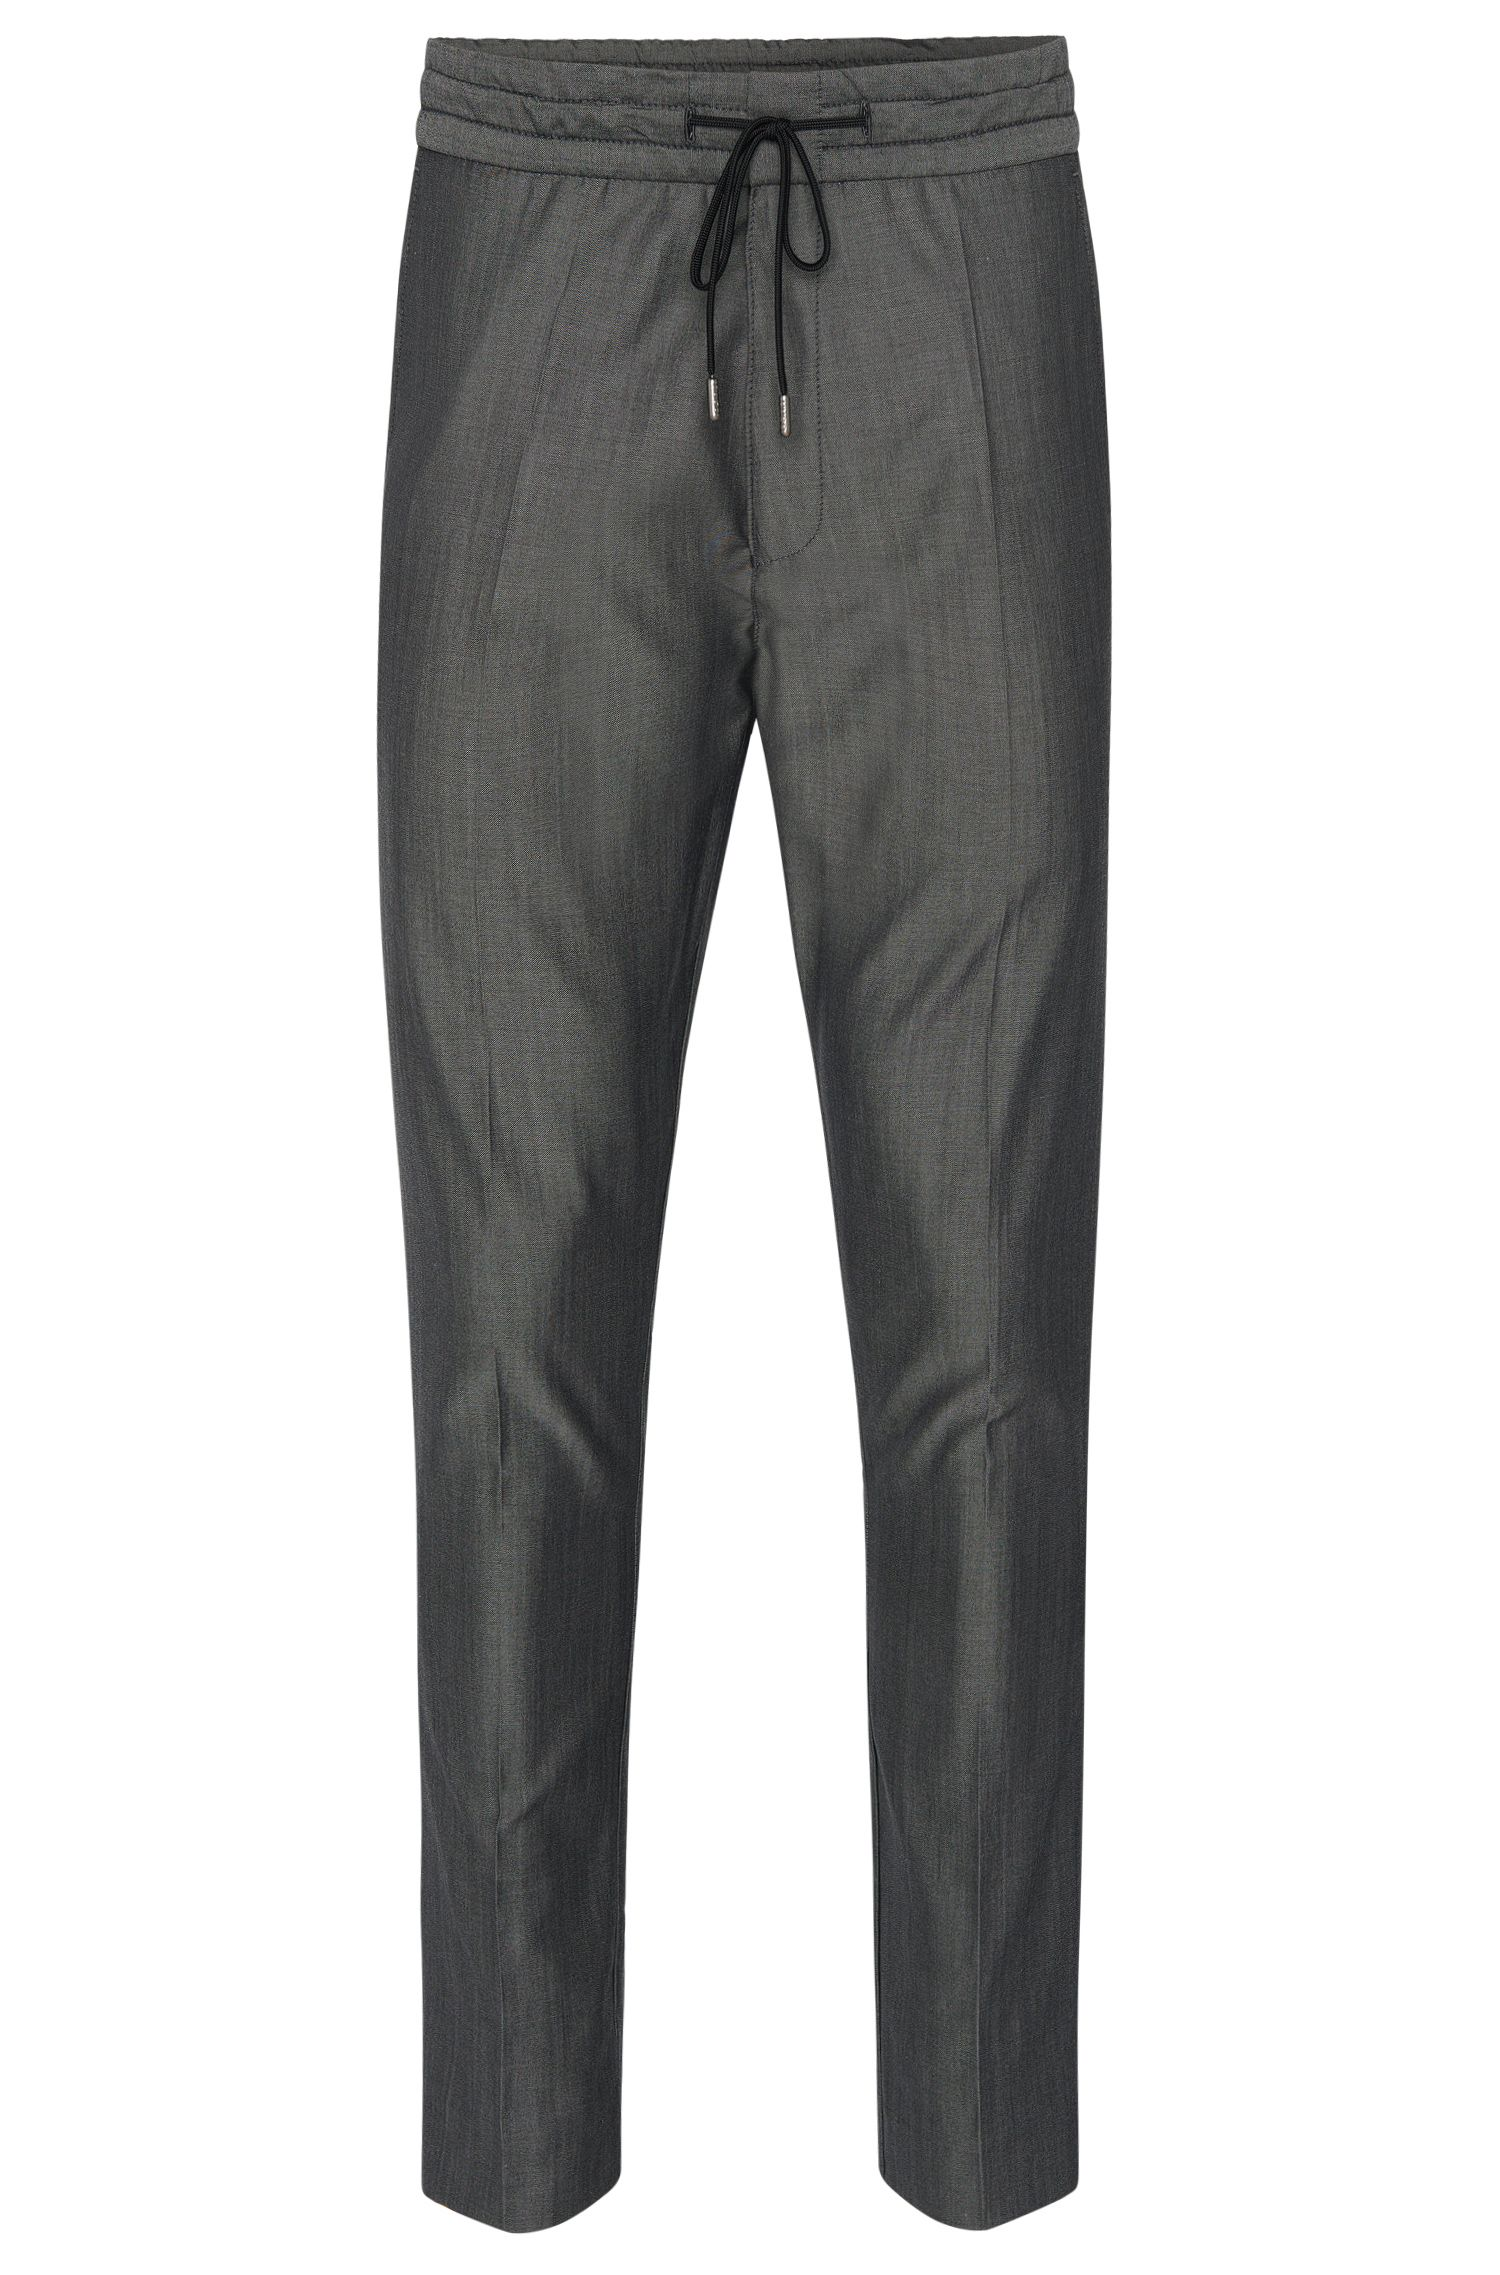 Virgin Wool Cotton Drawstring Pant, Tapered Fit | Himesh